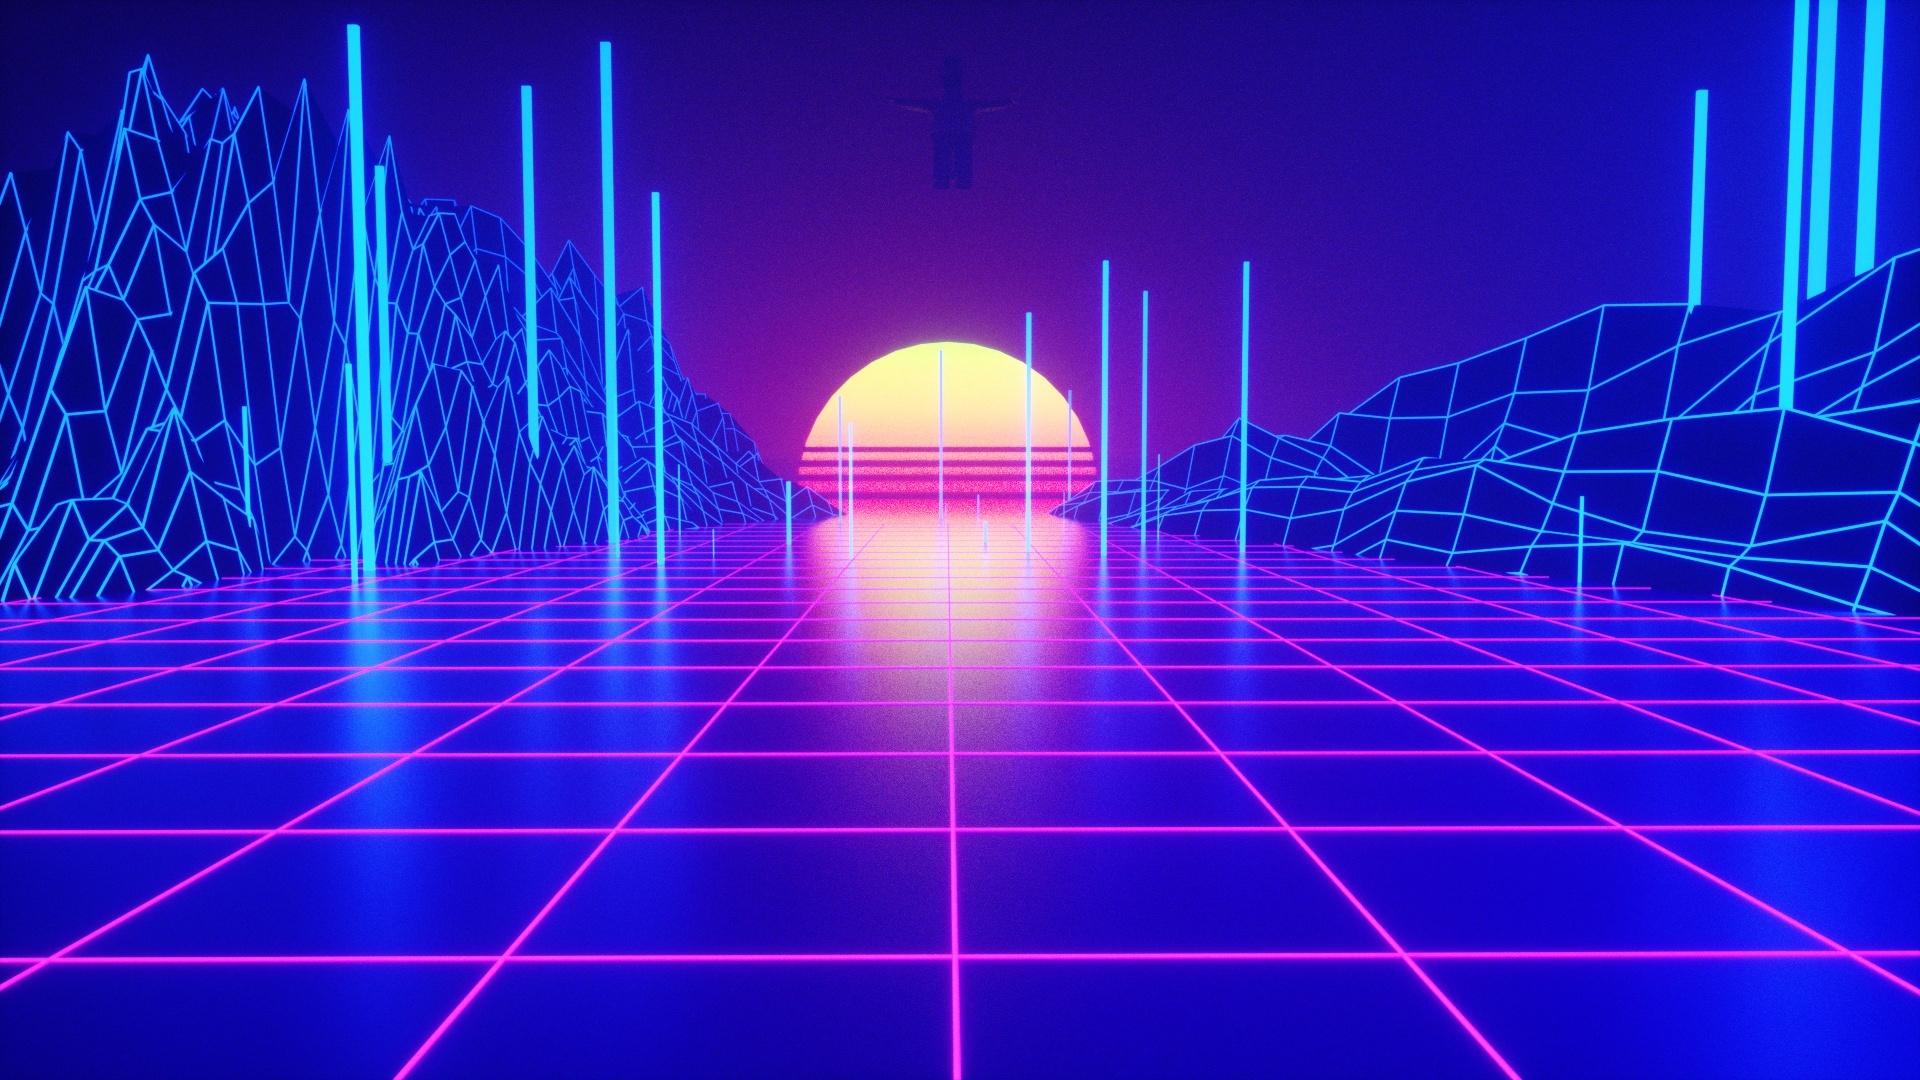 Neon background wallpaper